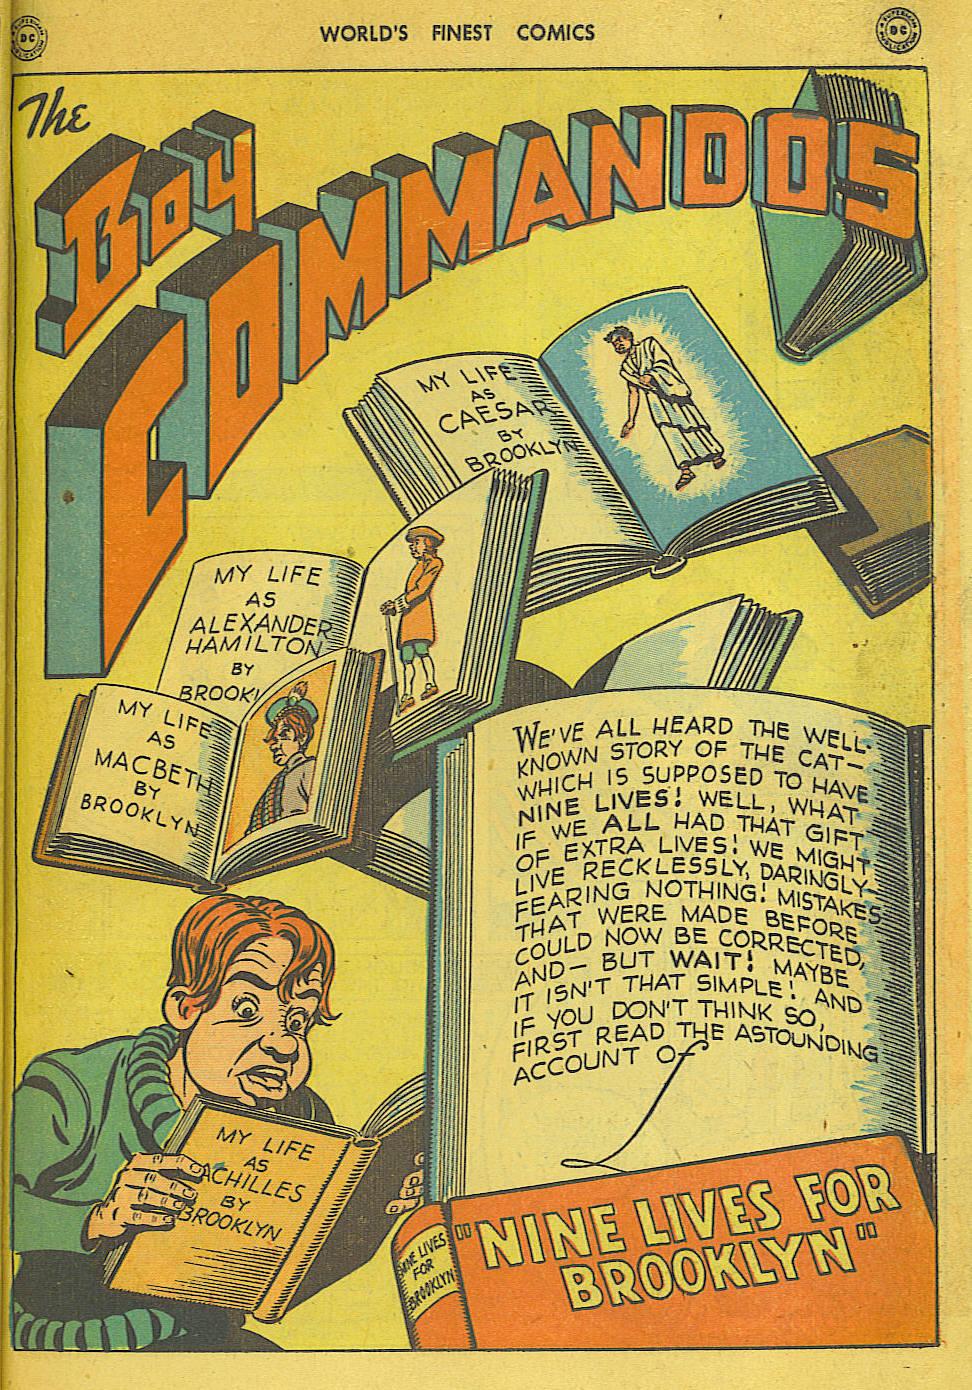 Read online World's Finest Comics comic -  Issue #34 - 27